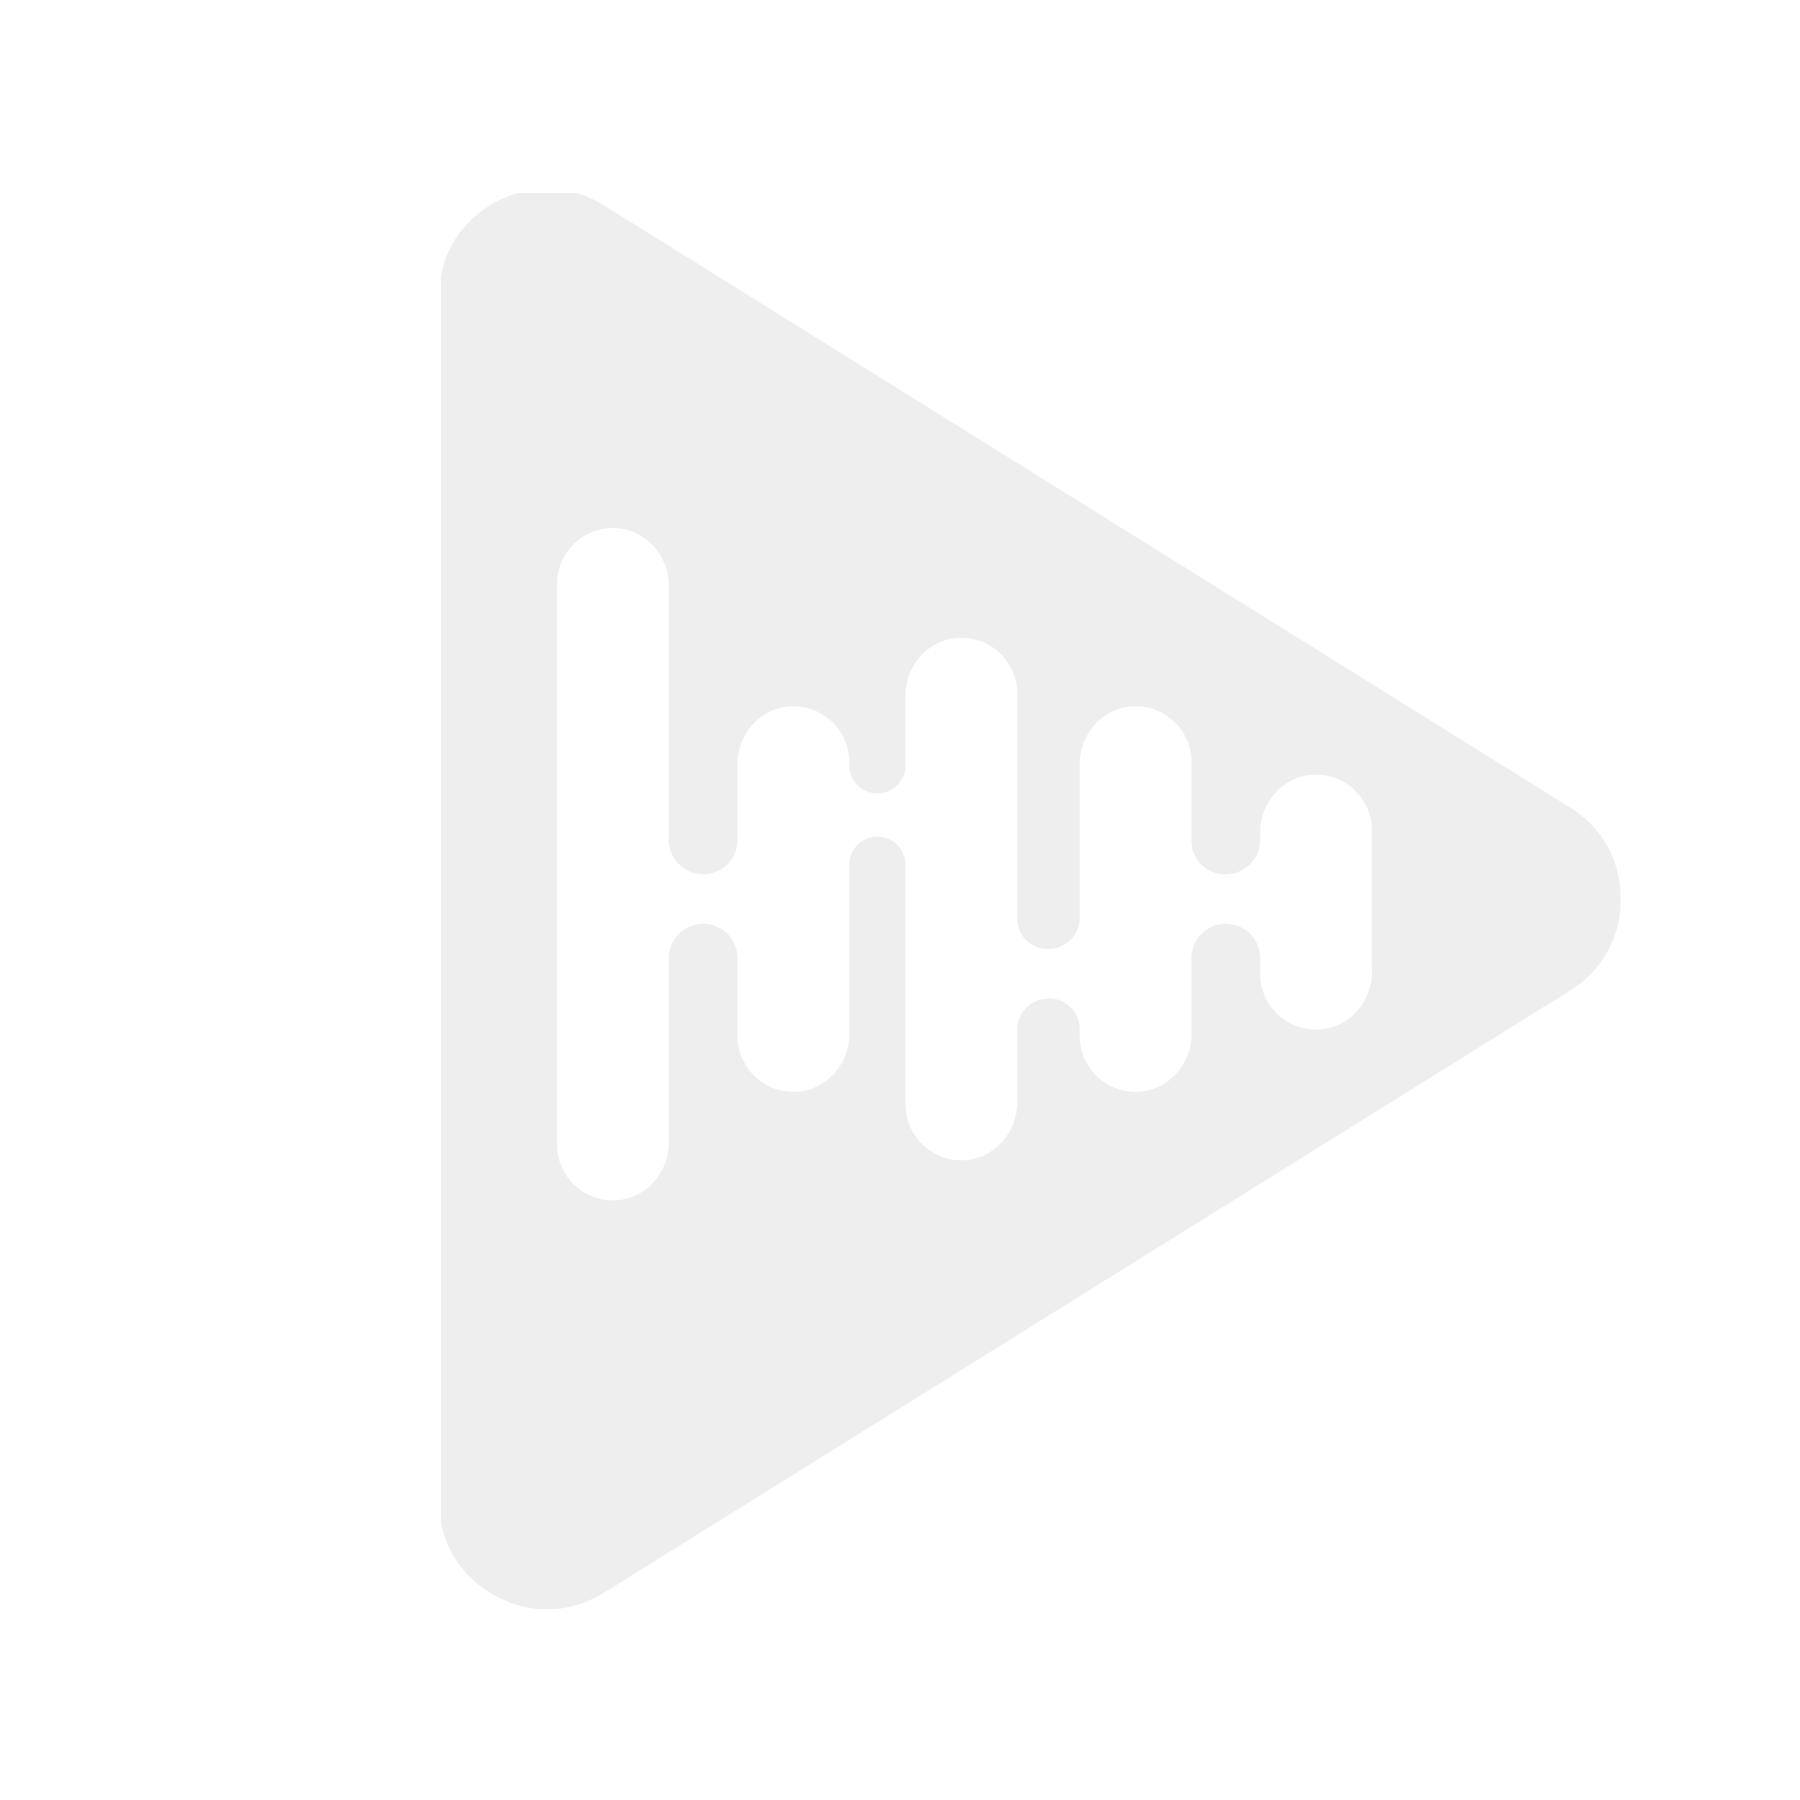 Speedsignal B-3674755-H